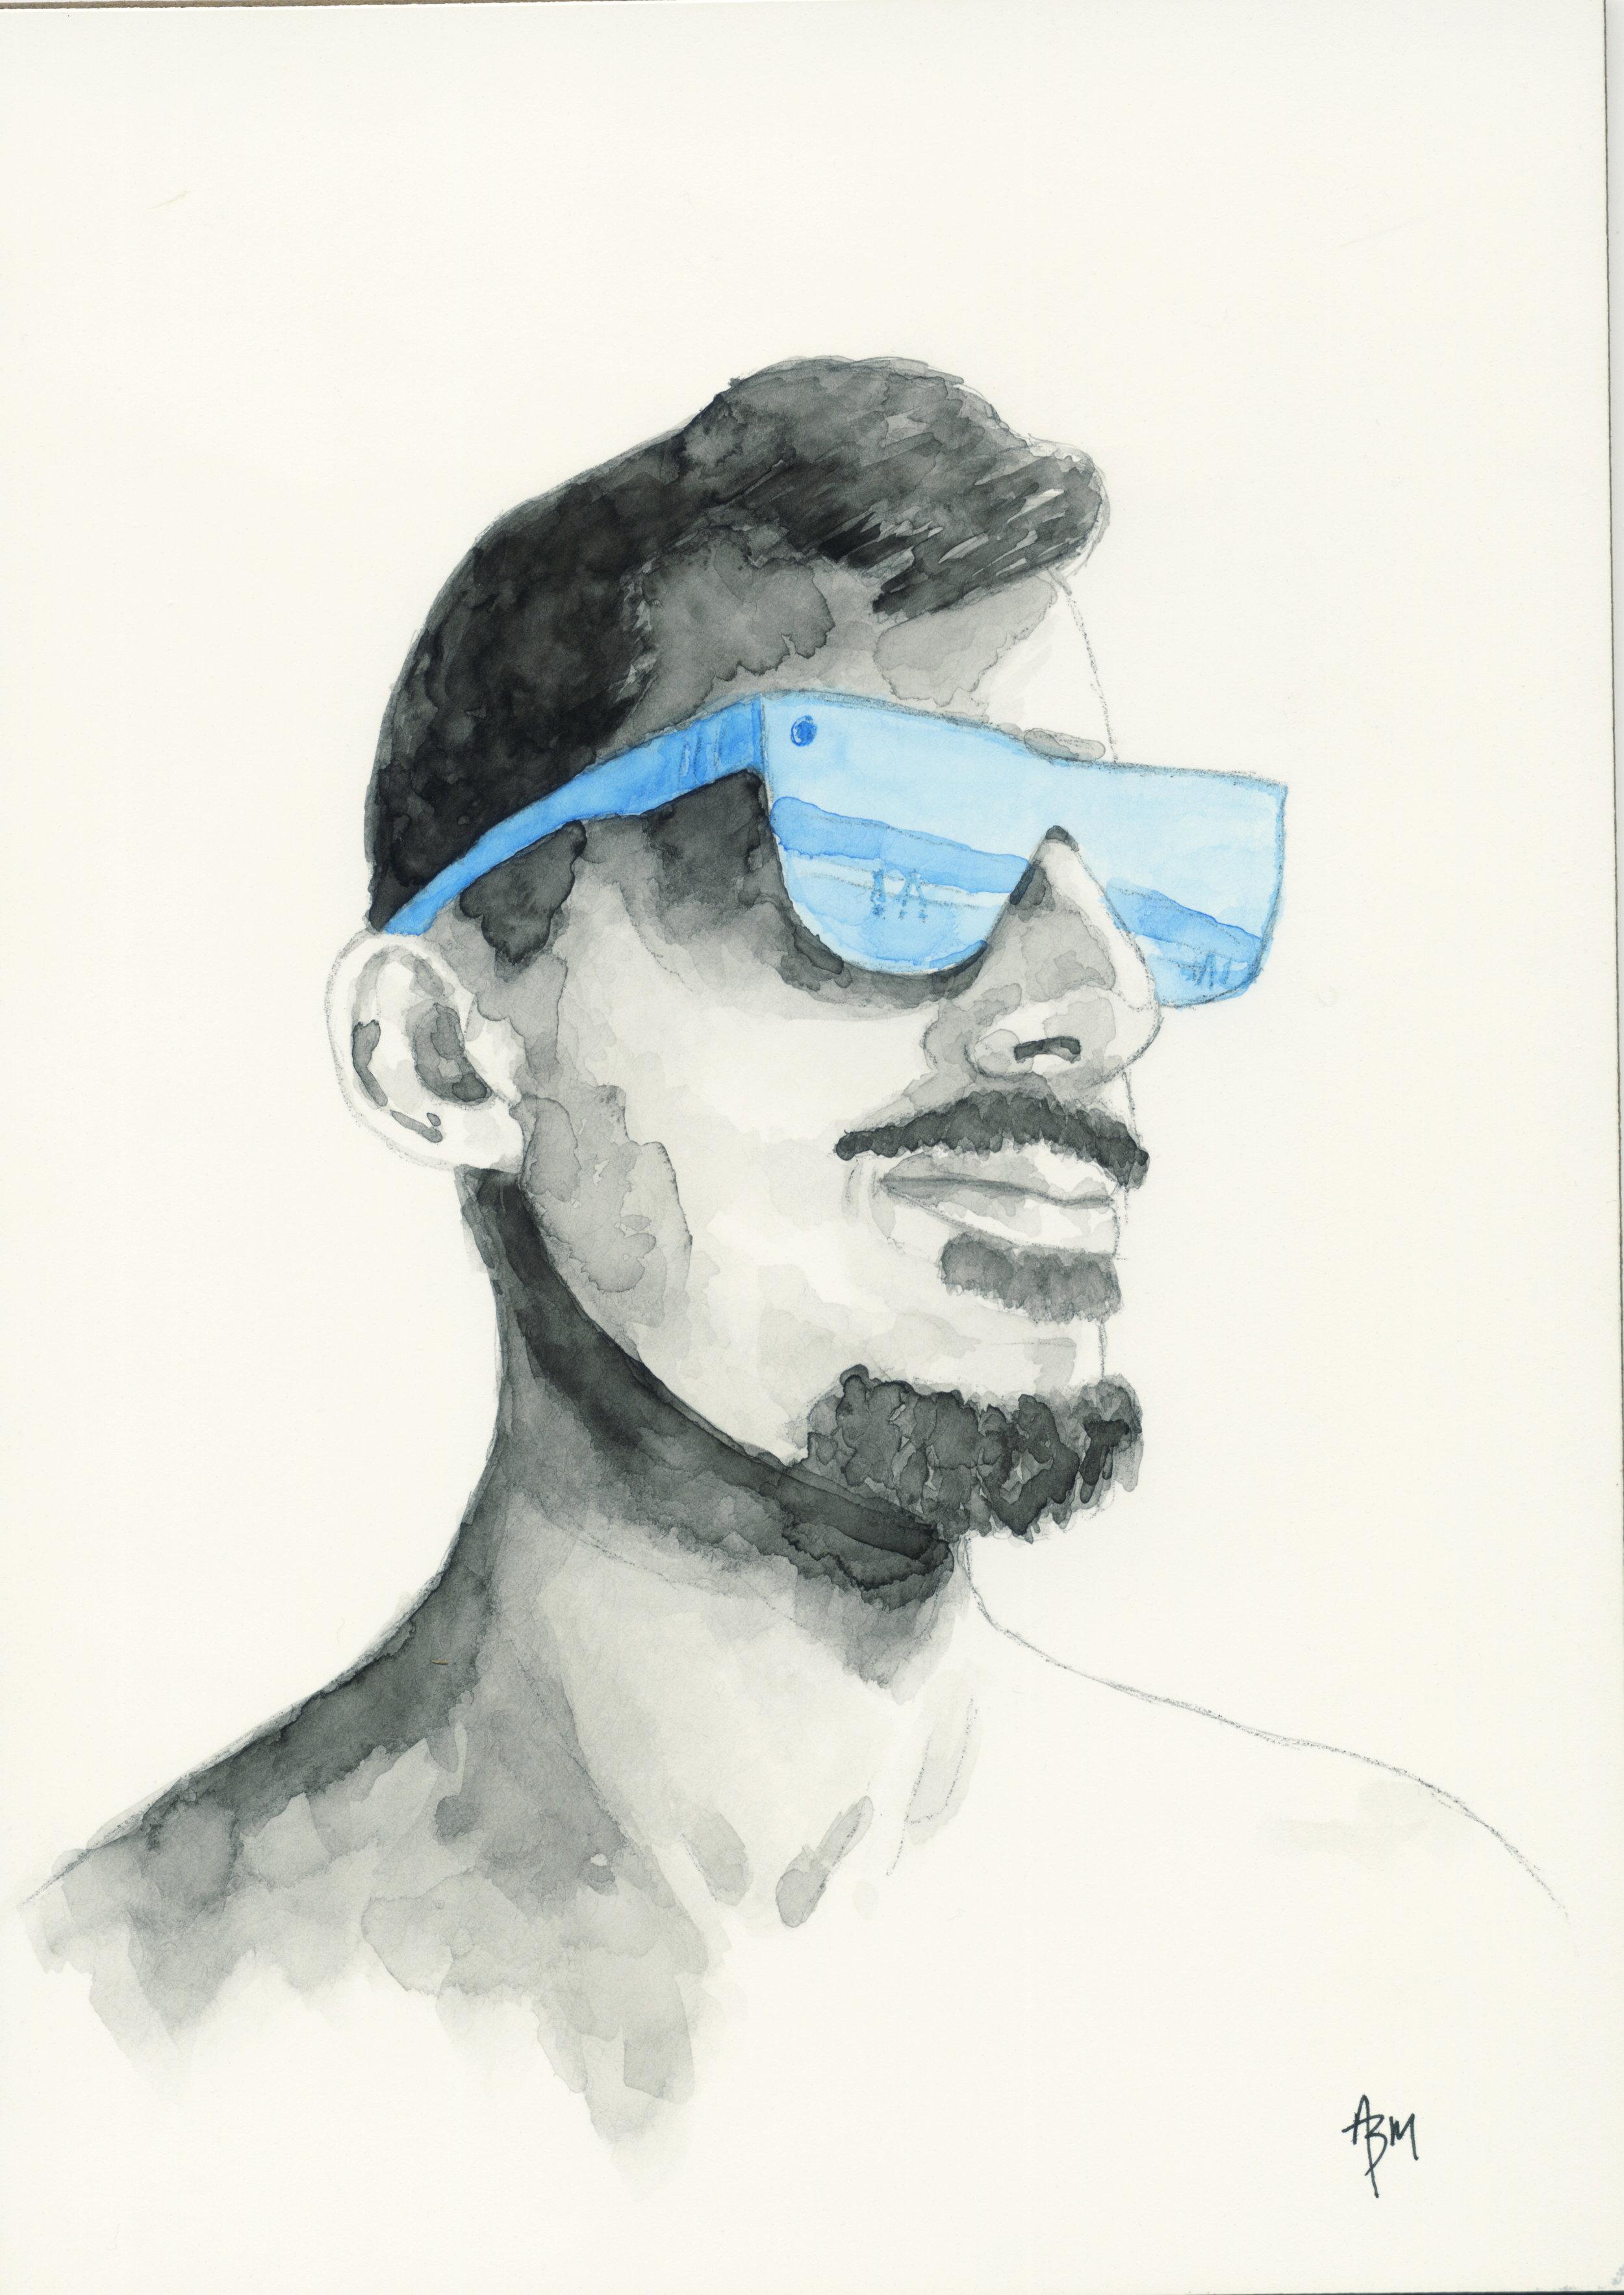 Blue Sunglasses - Watercolor on Clayboard